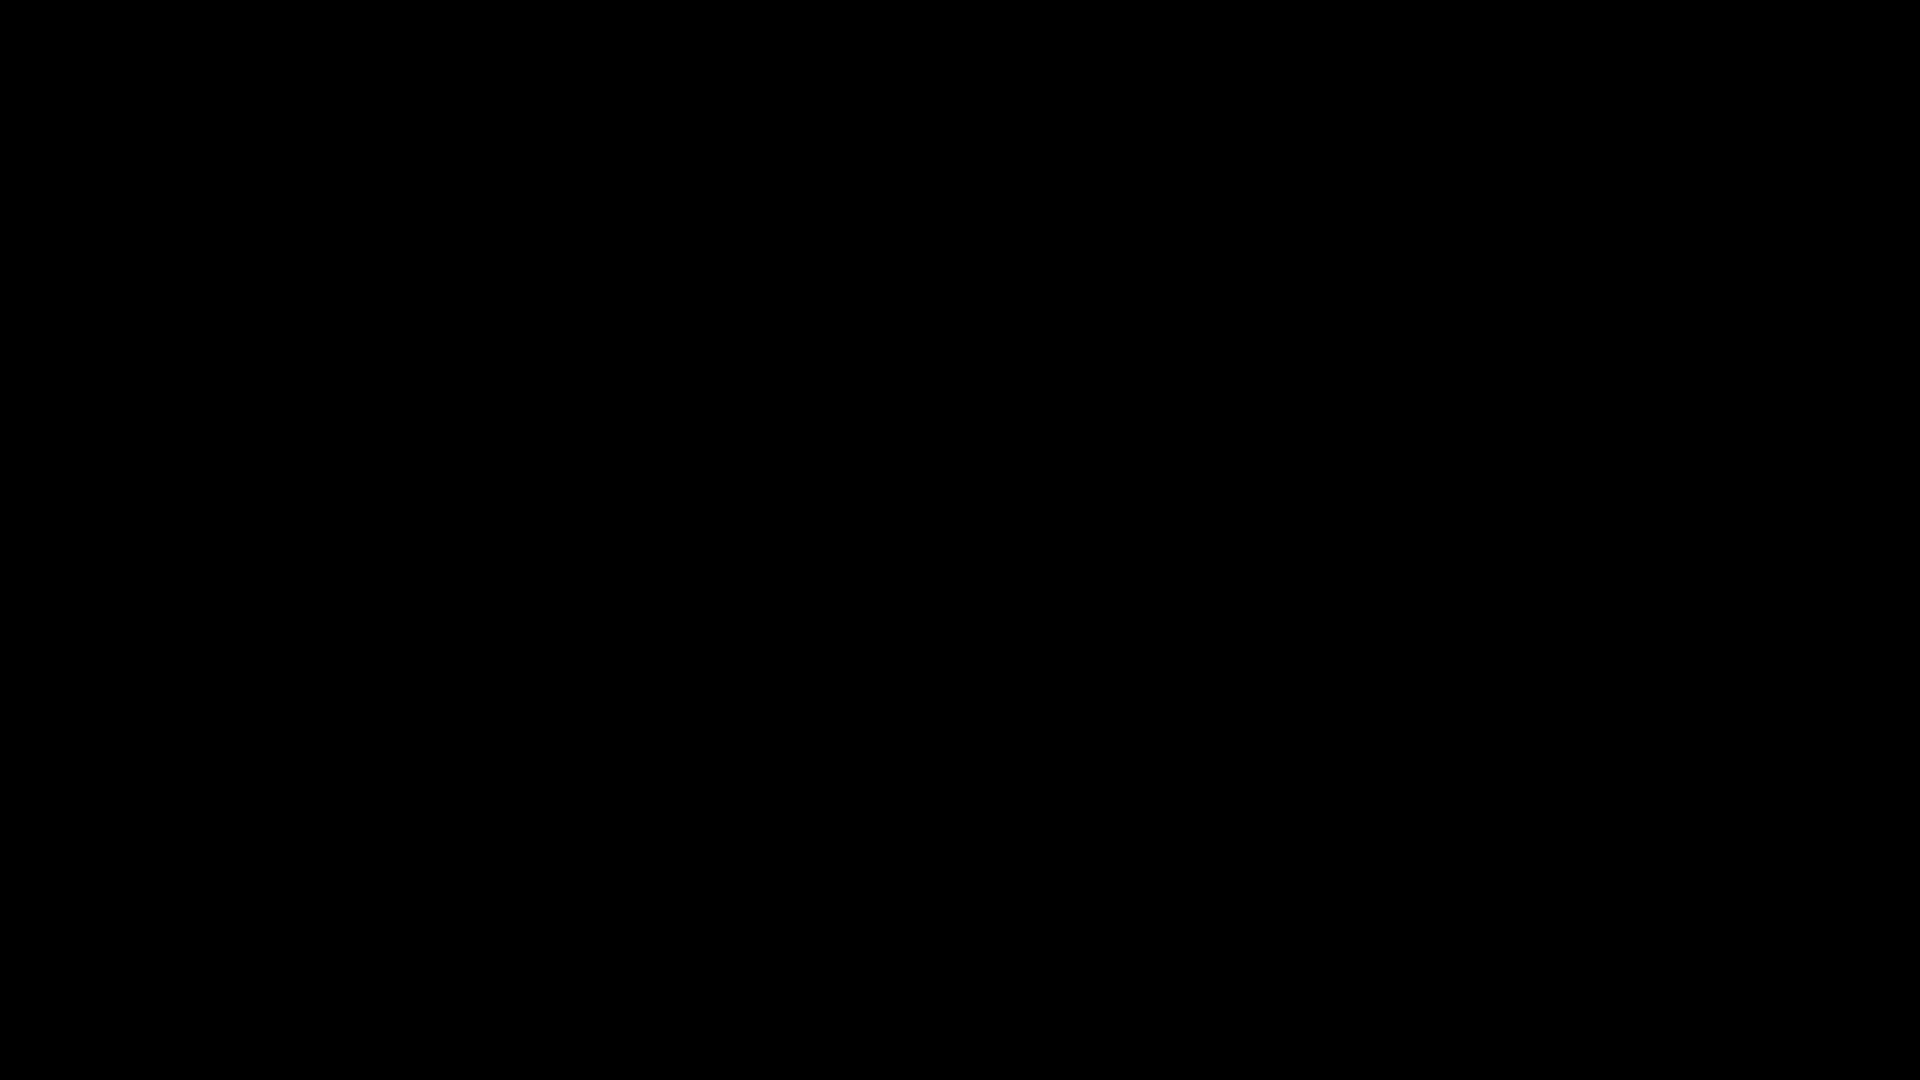 Endorcrine system